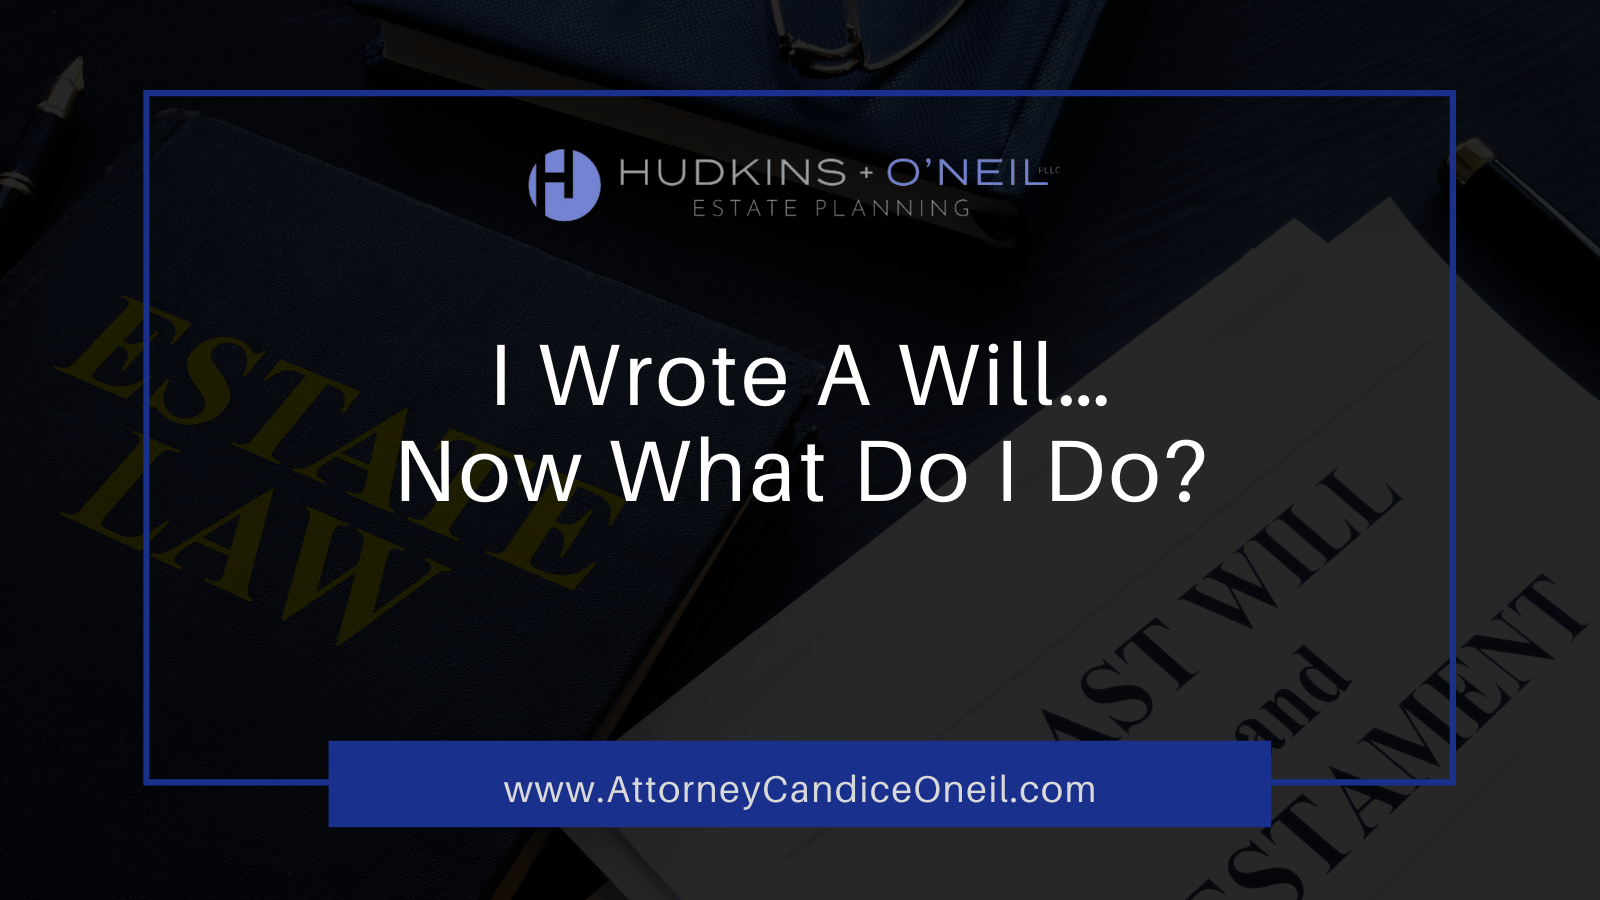 I Wrote A Will…Now What Do I Do? Attorney Candice O'Neil